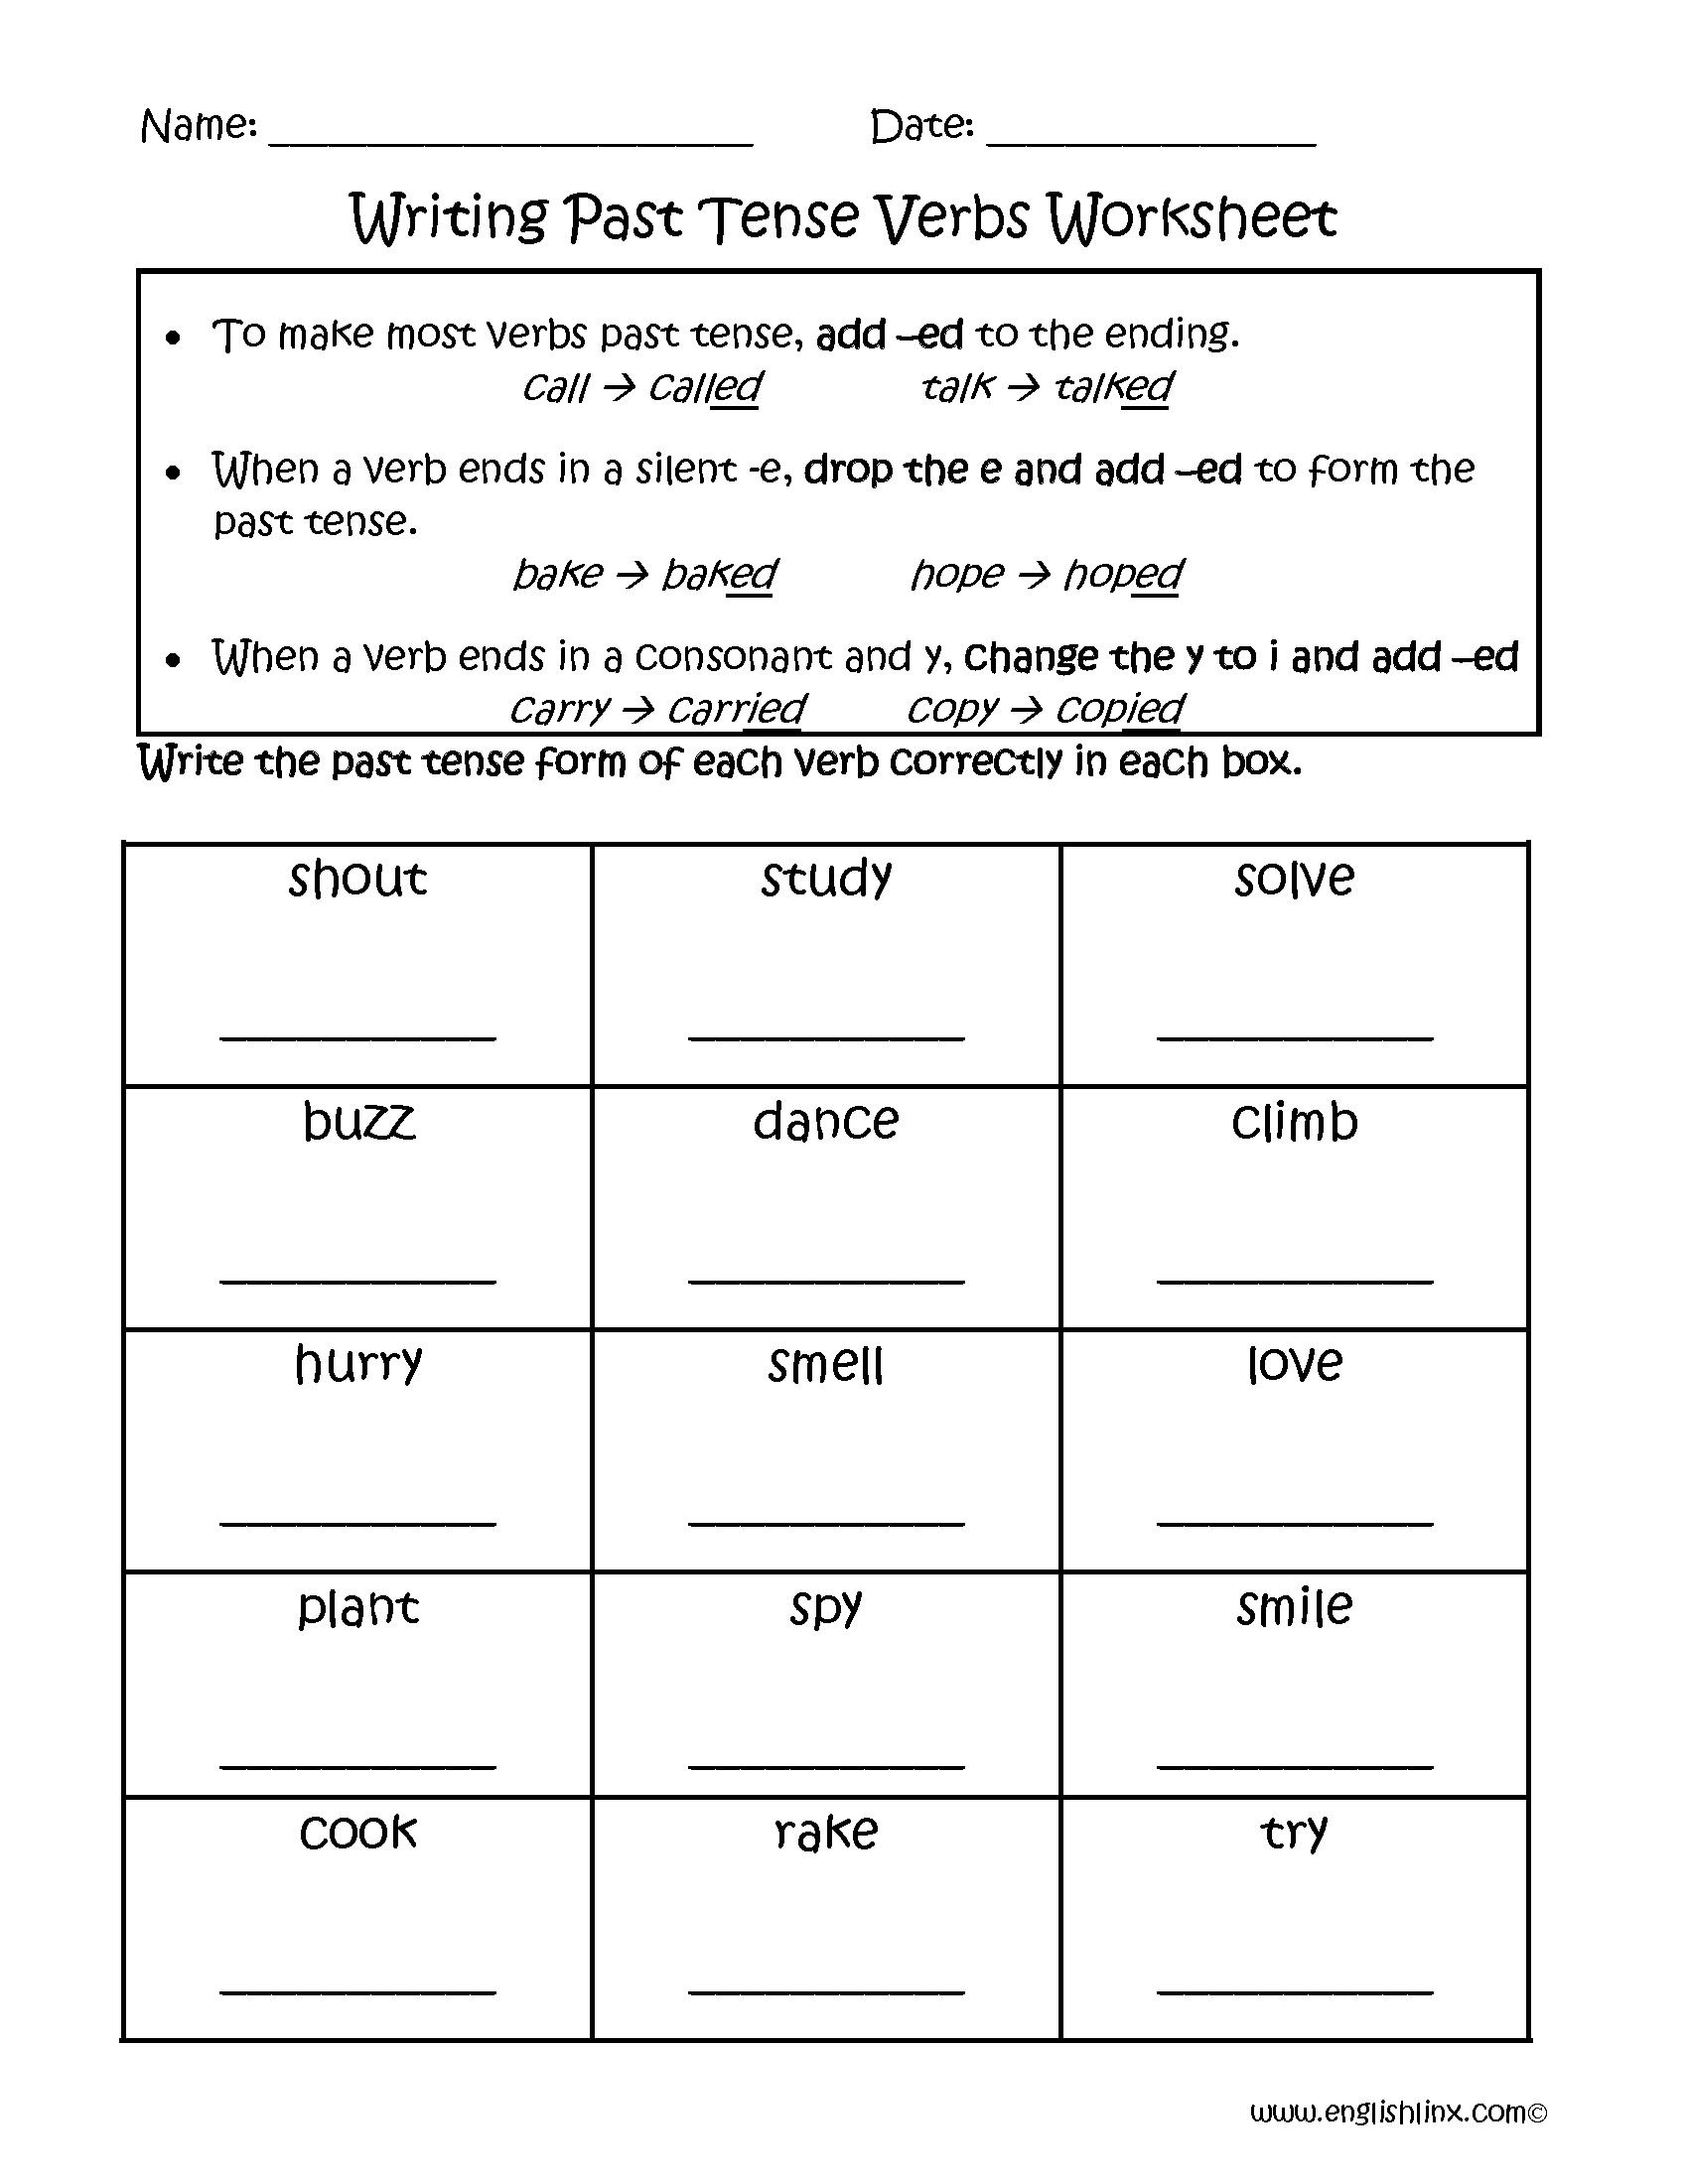 medium resolution of Writing Past Tense Verbs Worksheets   Verb worksheets